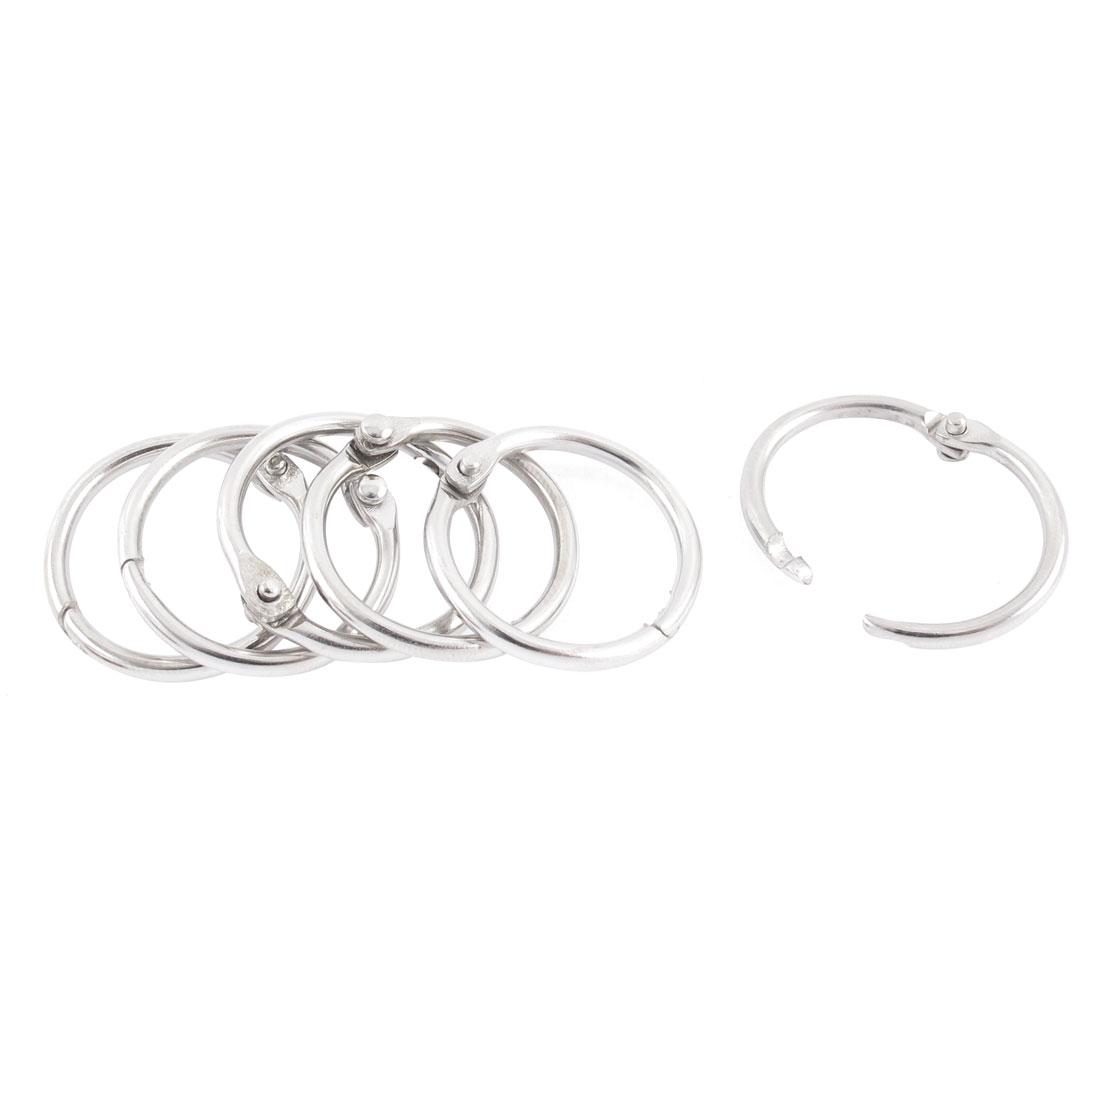 Book Office Metal Loose Leaf Binder Hinge Snap Ring Keyring Silver Tone 6pcs